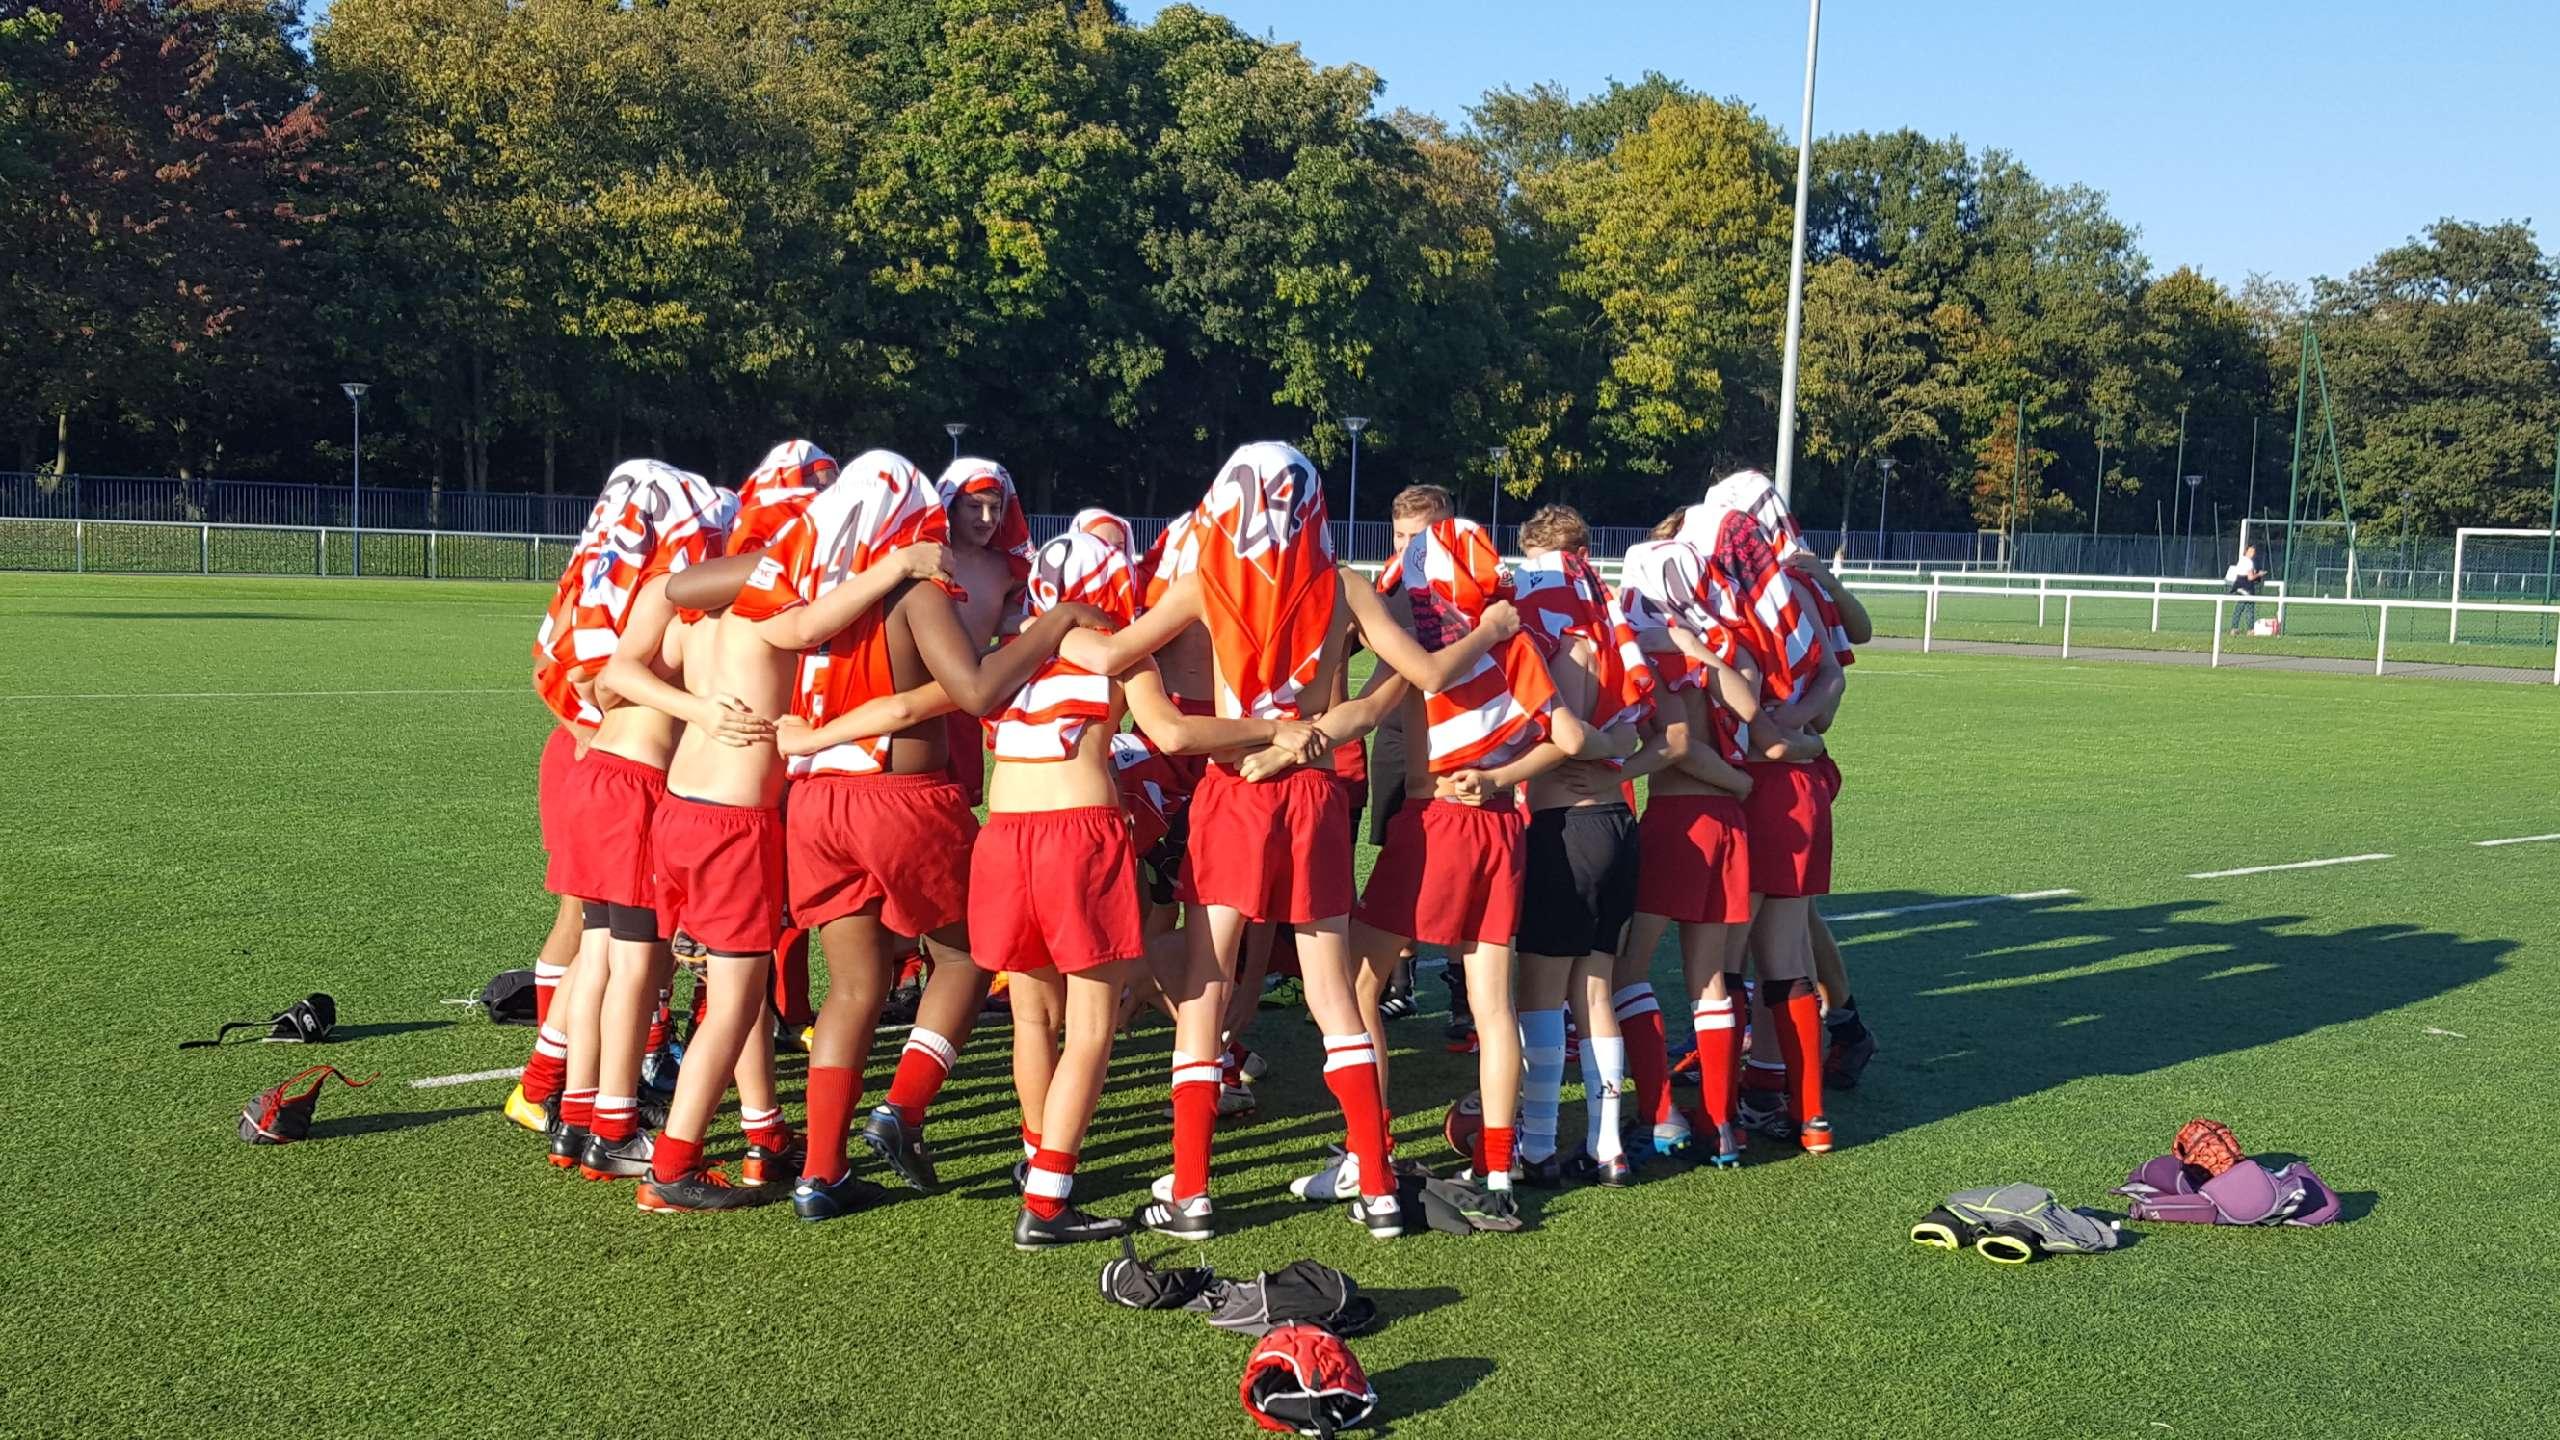 Clamart Rugby 92 Tournoi CPS U14 samedi 14 octobre 2017 contre Antony, Nanterre, Boulogne